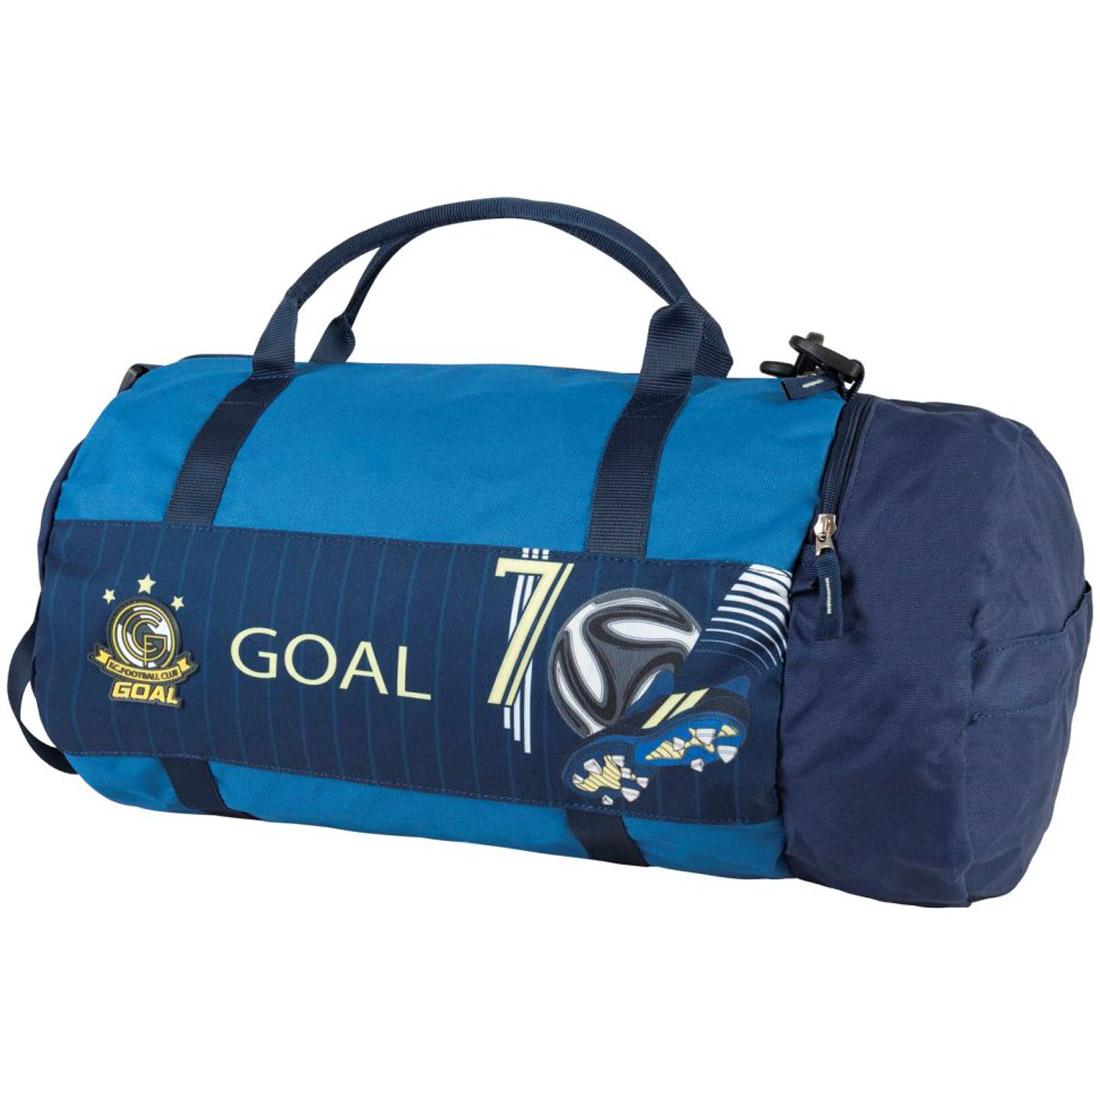 Дорожная сумка Target Реал Мадрид<br>